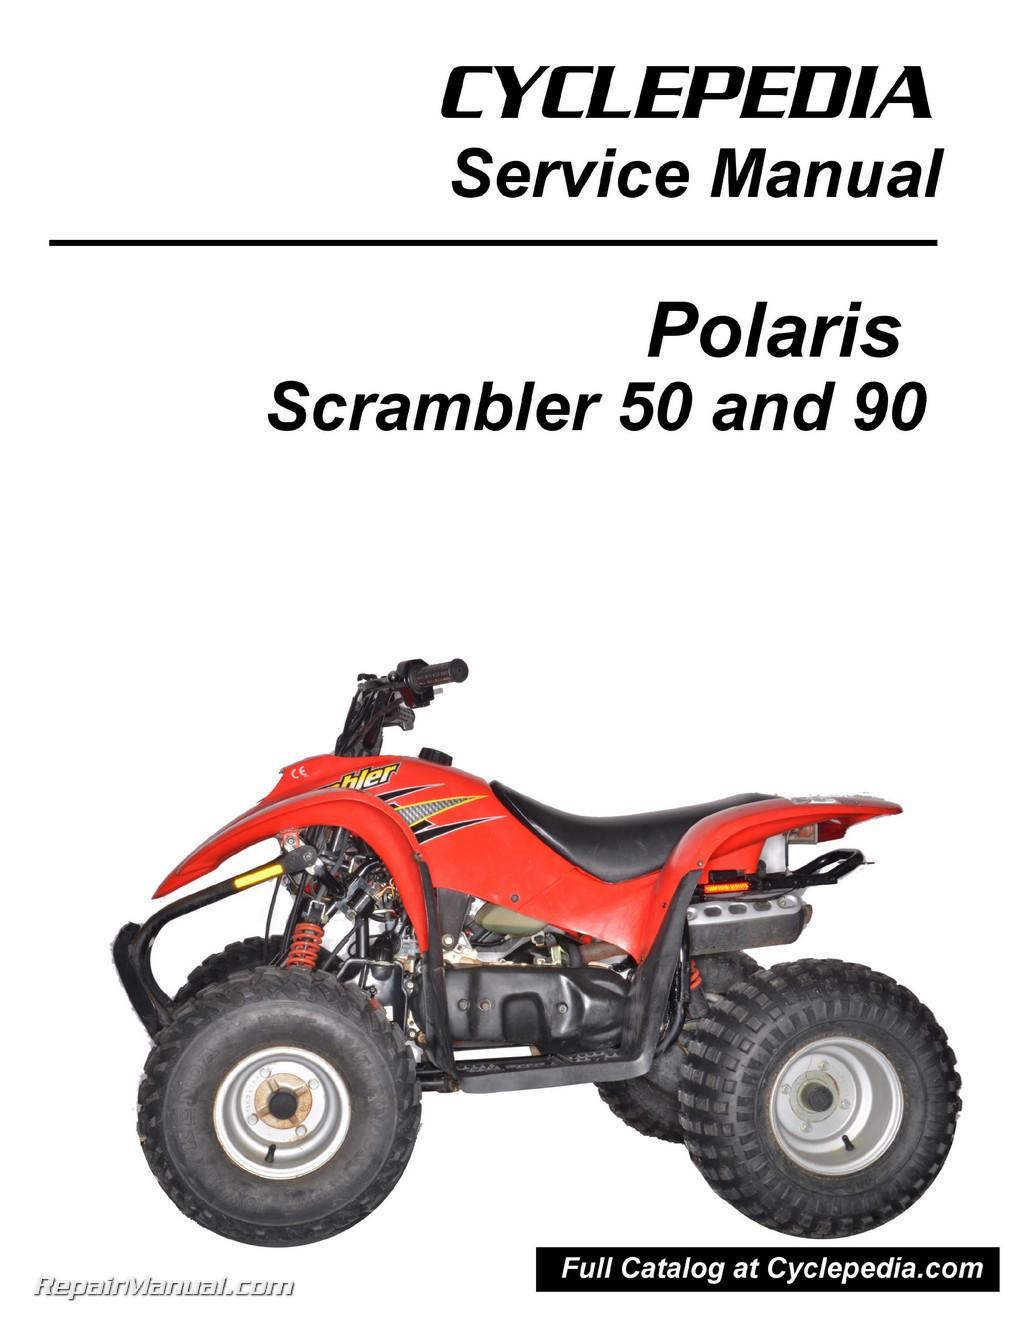 Polaris xplorer 400 manual ebook array 1999 polaris scrambler 400 owners manual amtcars org rh amtcars org fandeluxe Choice Image